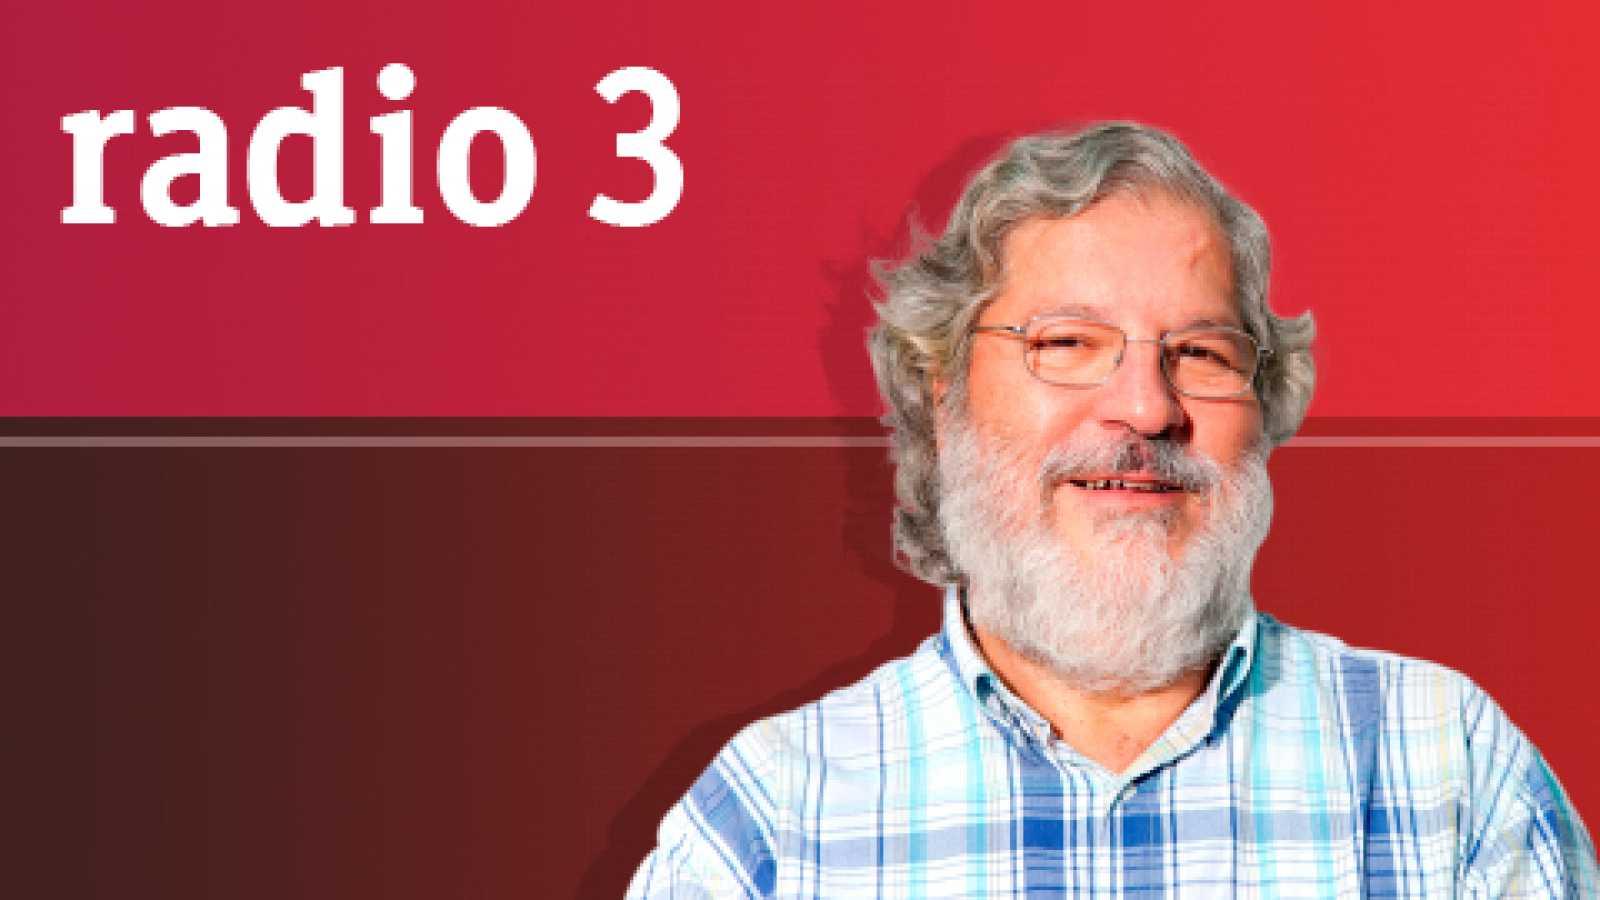 Discópolis 10.979 - Sesiones Tesoro RNE 125: Danza I.-Polanski-Esqueletos - 10/06/20 - escuchar ahora